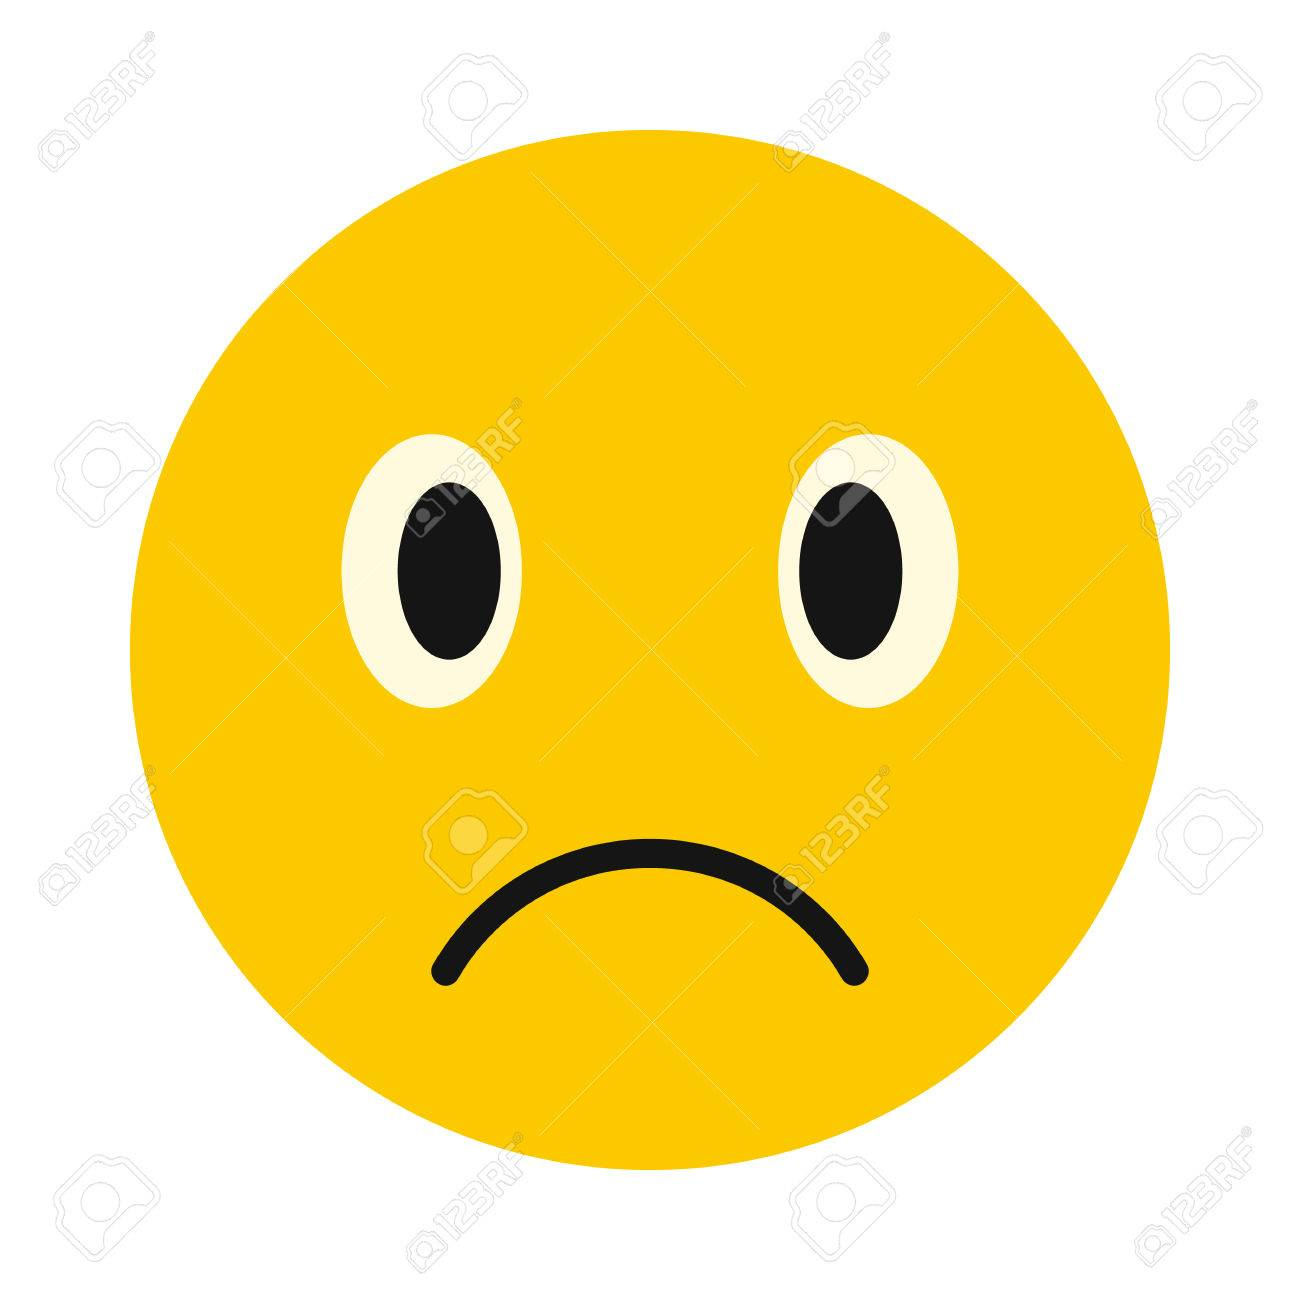 sad face icon in flat style isolated on white background facial rh 123rf com cartoon sad face drawing cartoon sad face crying